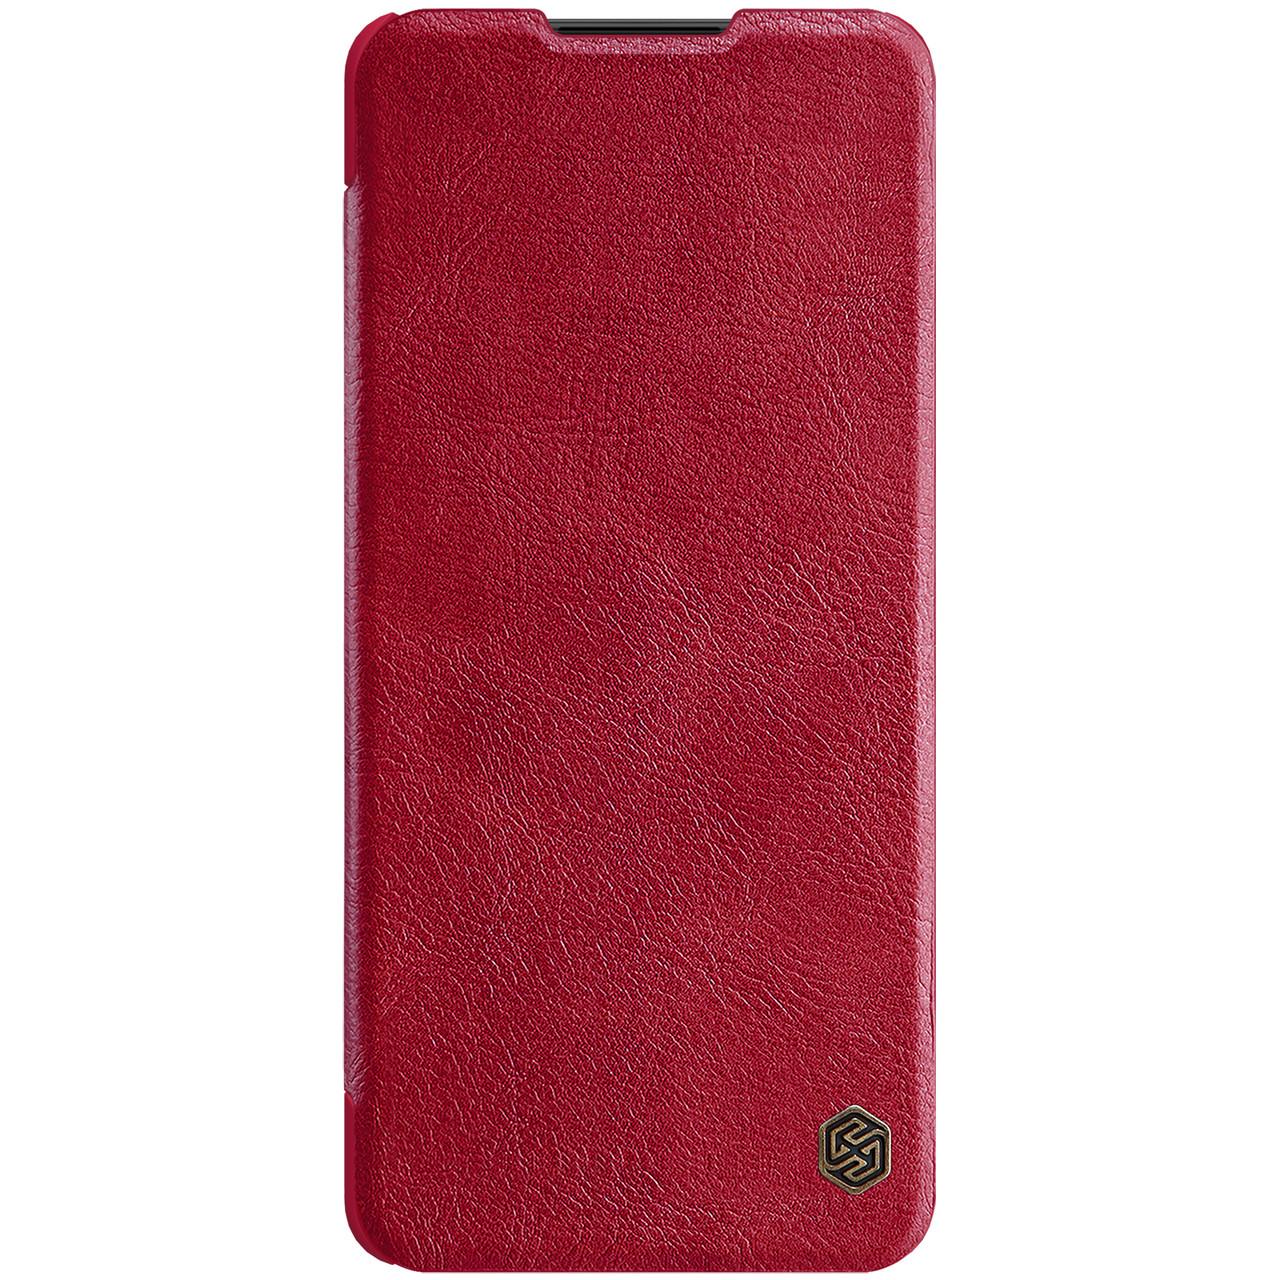 Защитный чехол-книжка Nillkin для Samsung Galaxy A42 5G Qin leather case Red